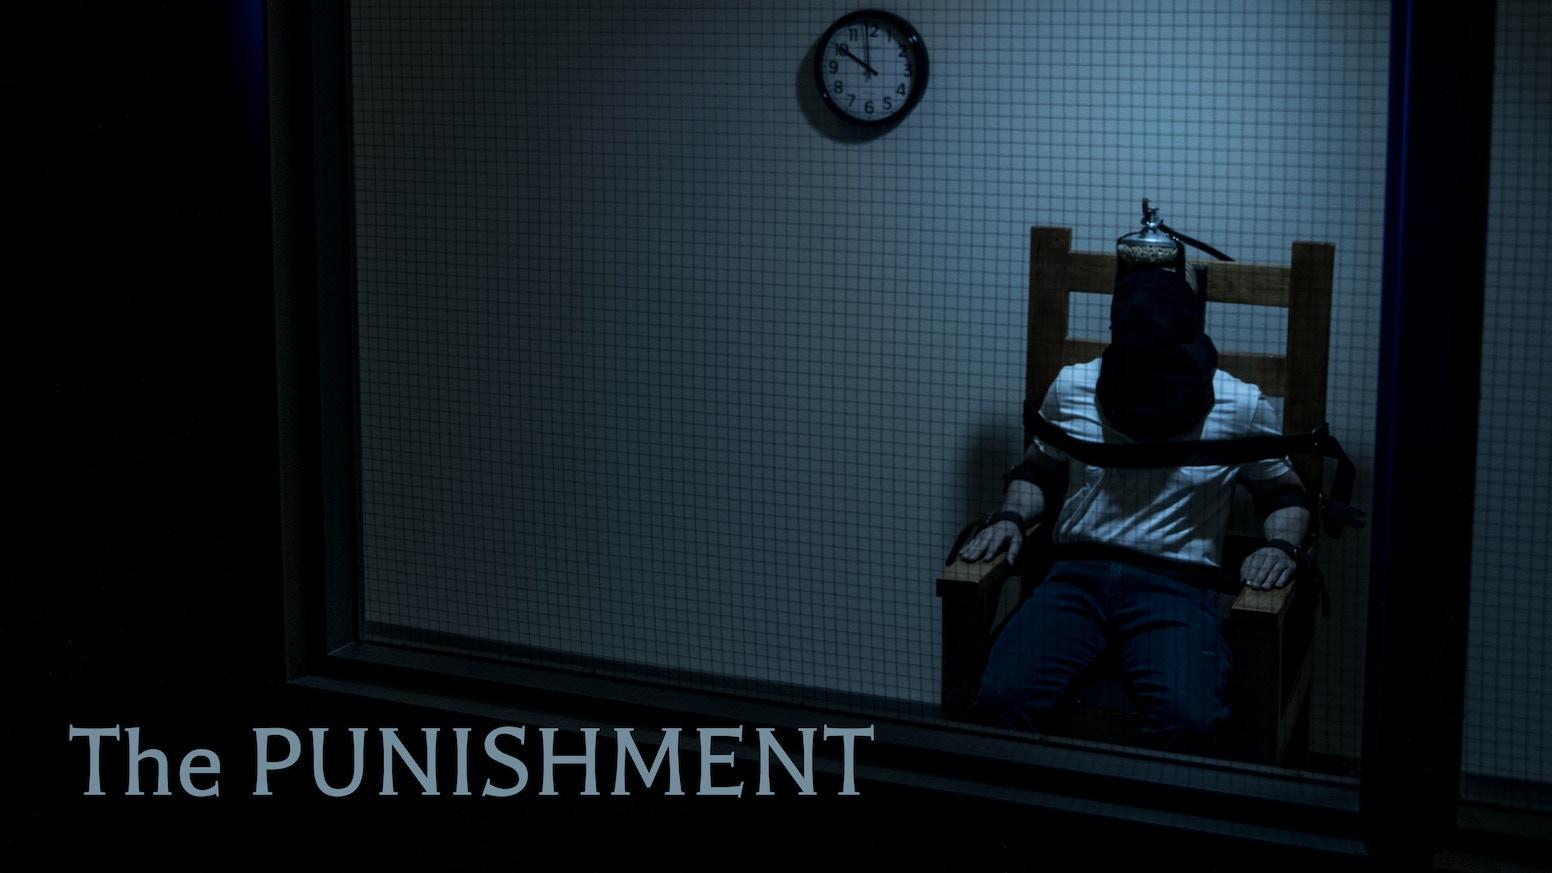 the punishment a short film by andres segura kickstarter